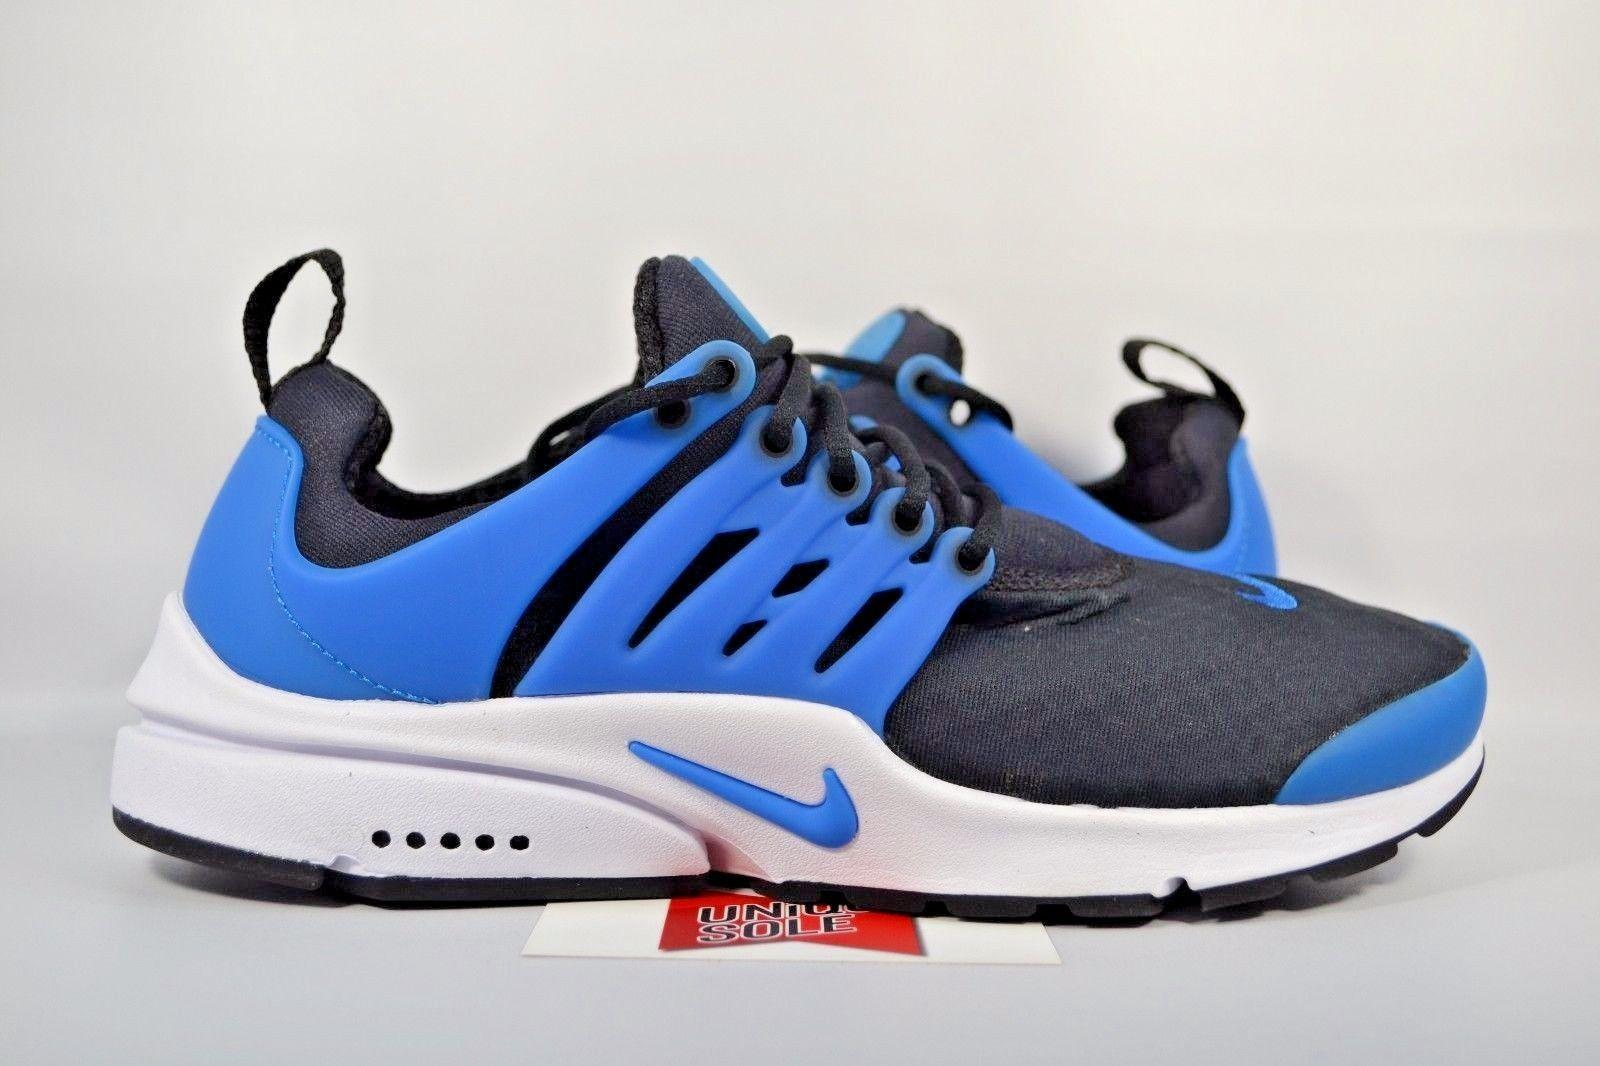 Nueva Nike Air Presto Imprescindible Foto 848187 005 Azul Sz 9 Hombres Negro Azul 005 b4df6d